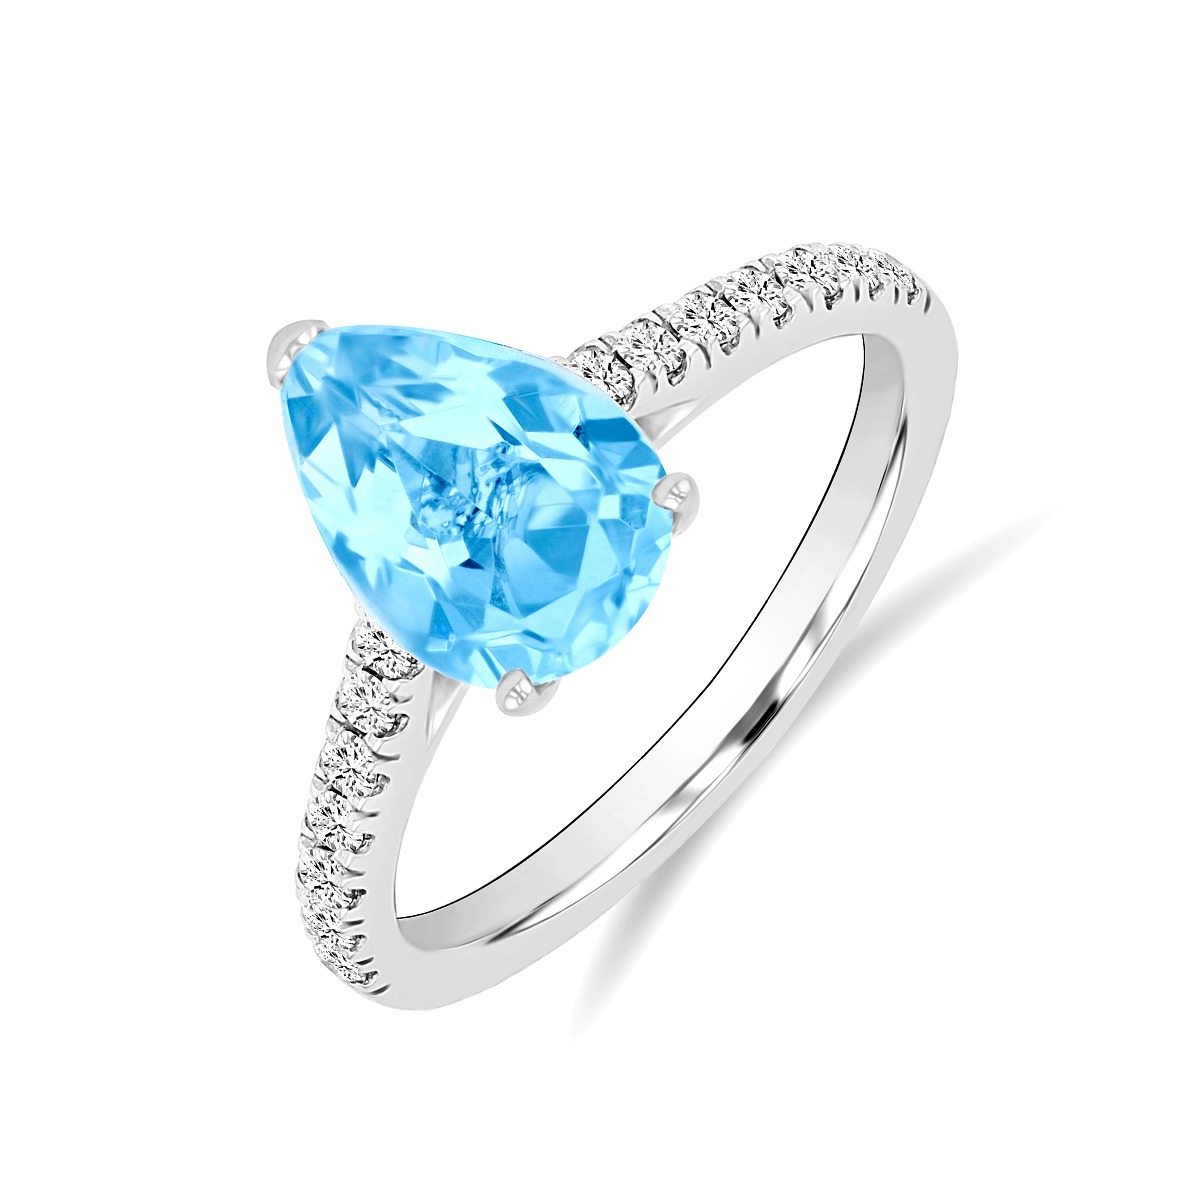 Riviera Collection 1.61ct Aquamarine & Diamond Ring | 9K White Gold